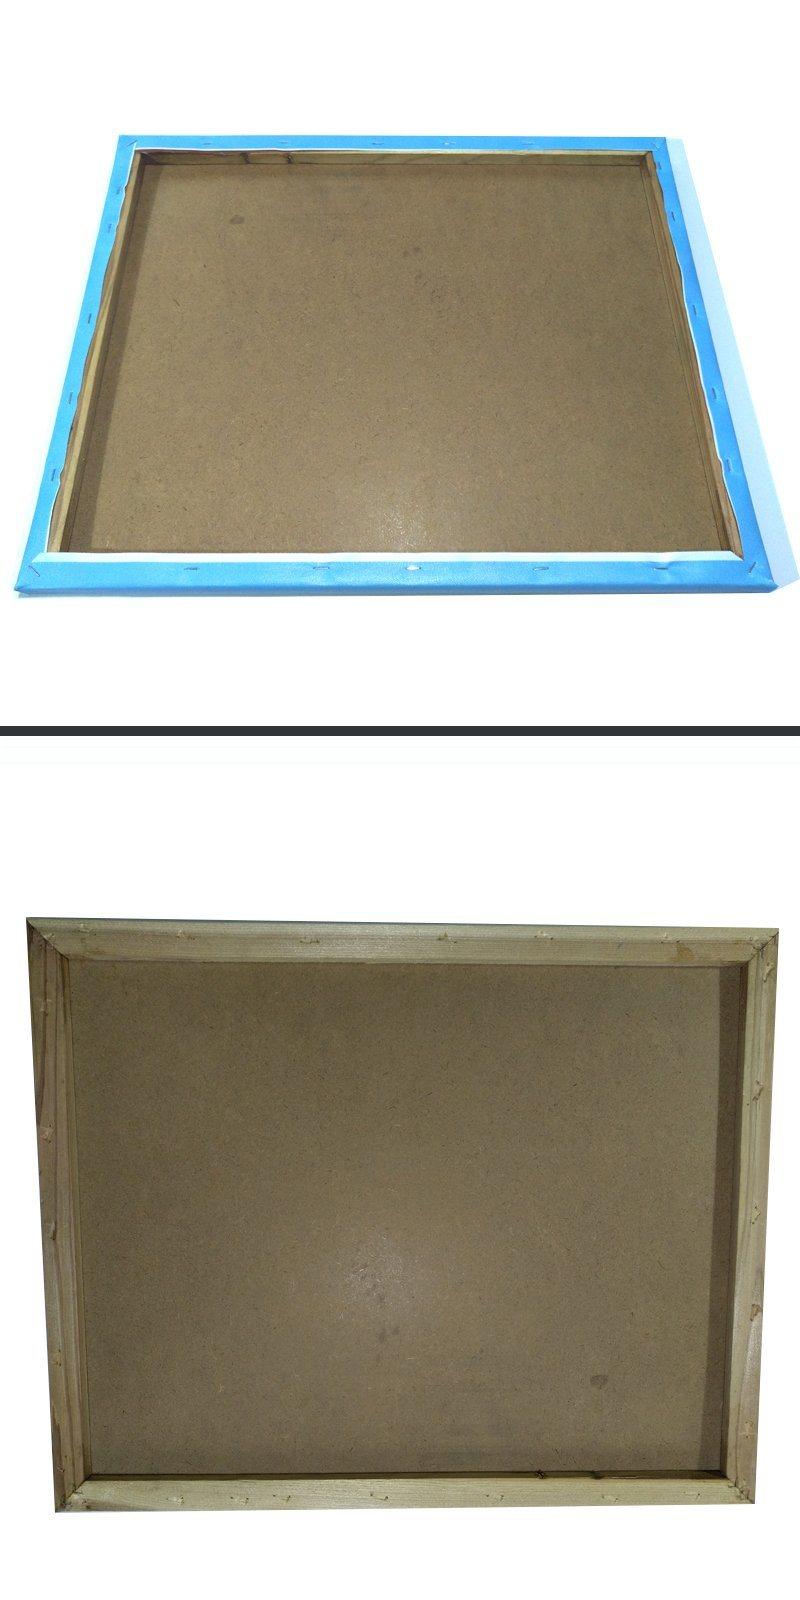 Wholesale Cheapest Cross Stitch, DIY Diamond Painting,